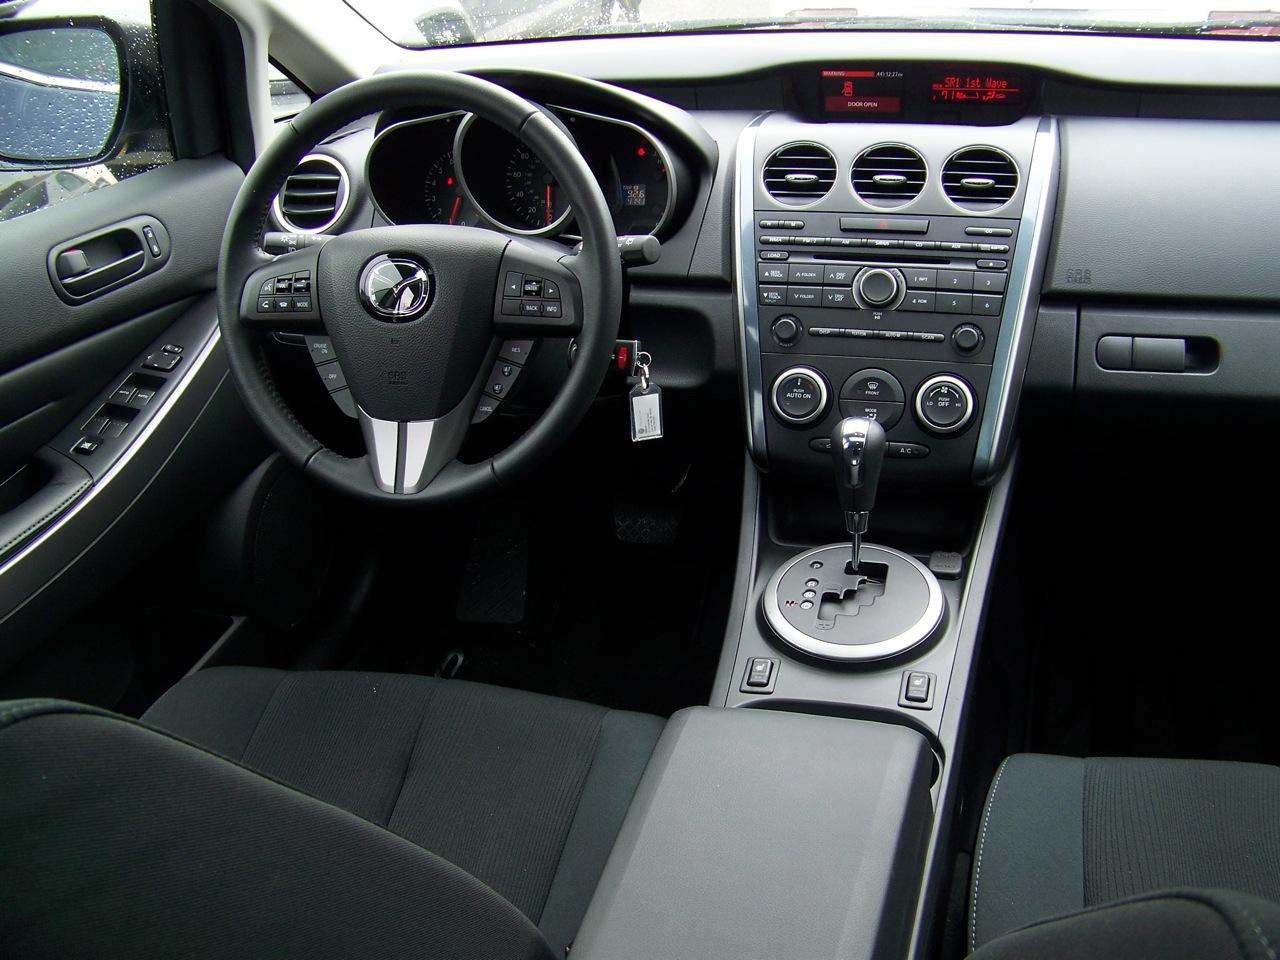 MAZDA CX-7 I interior